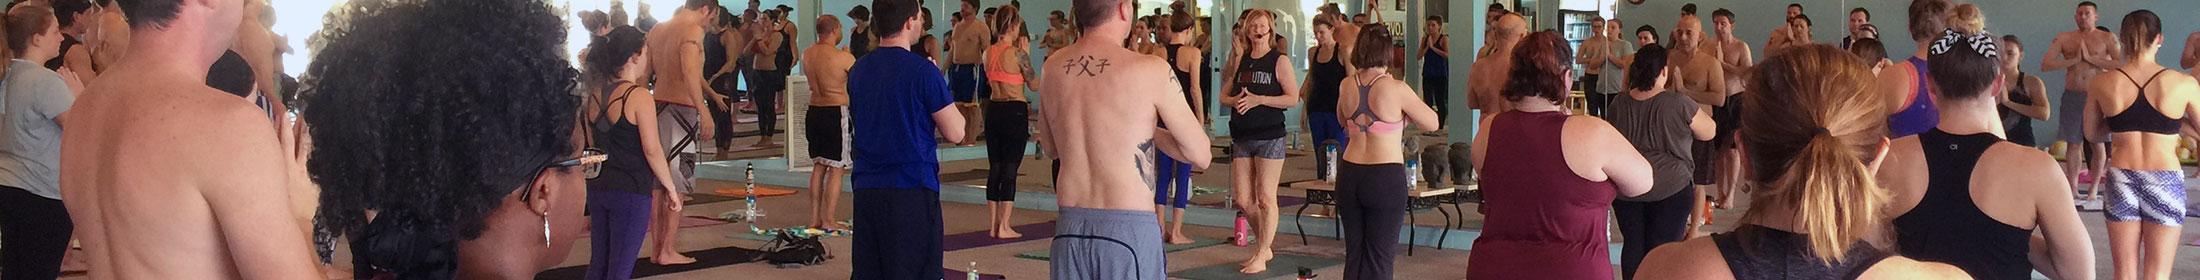 New Yoga Students